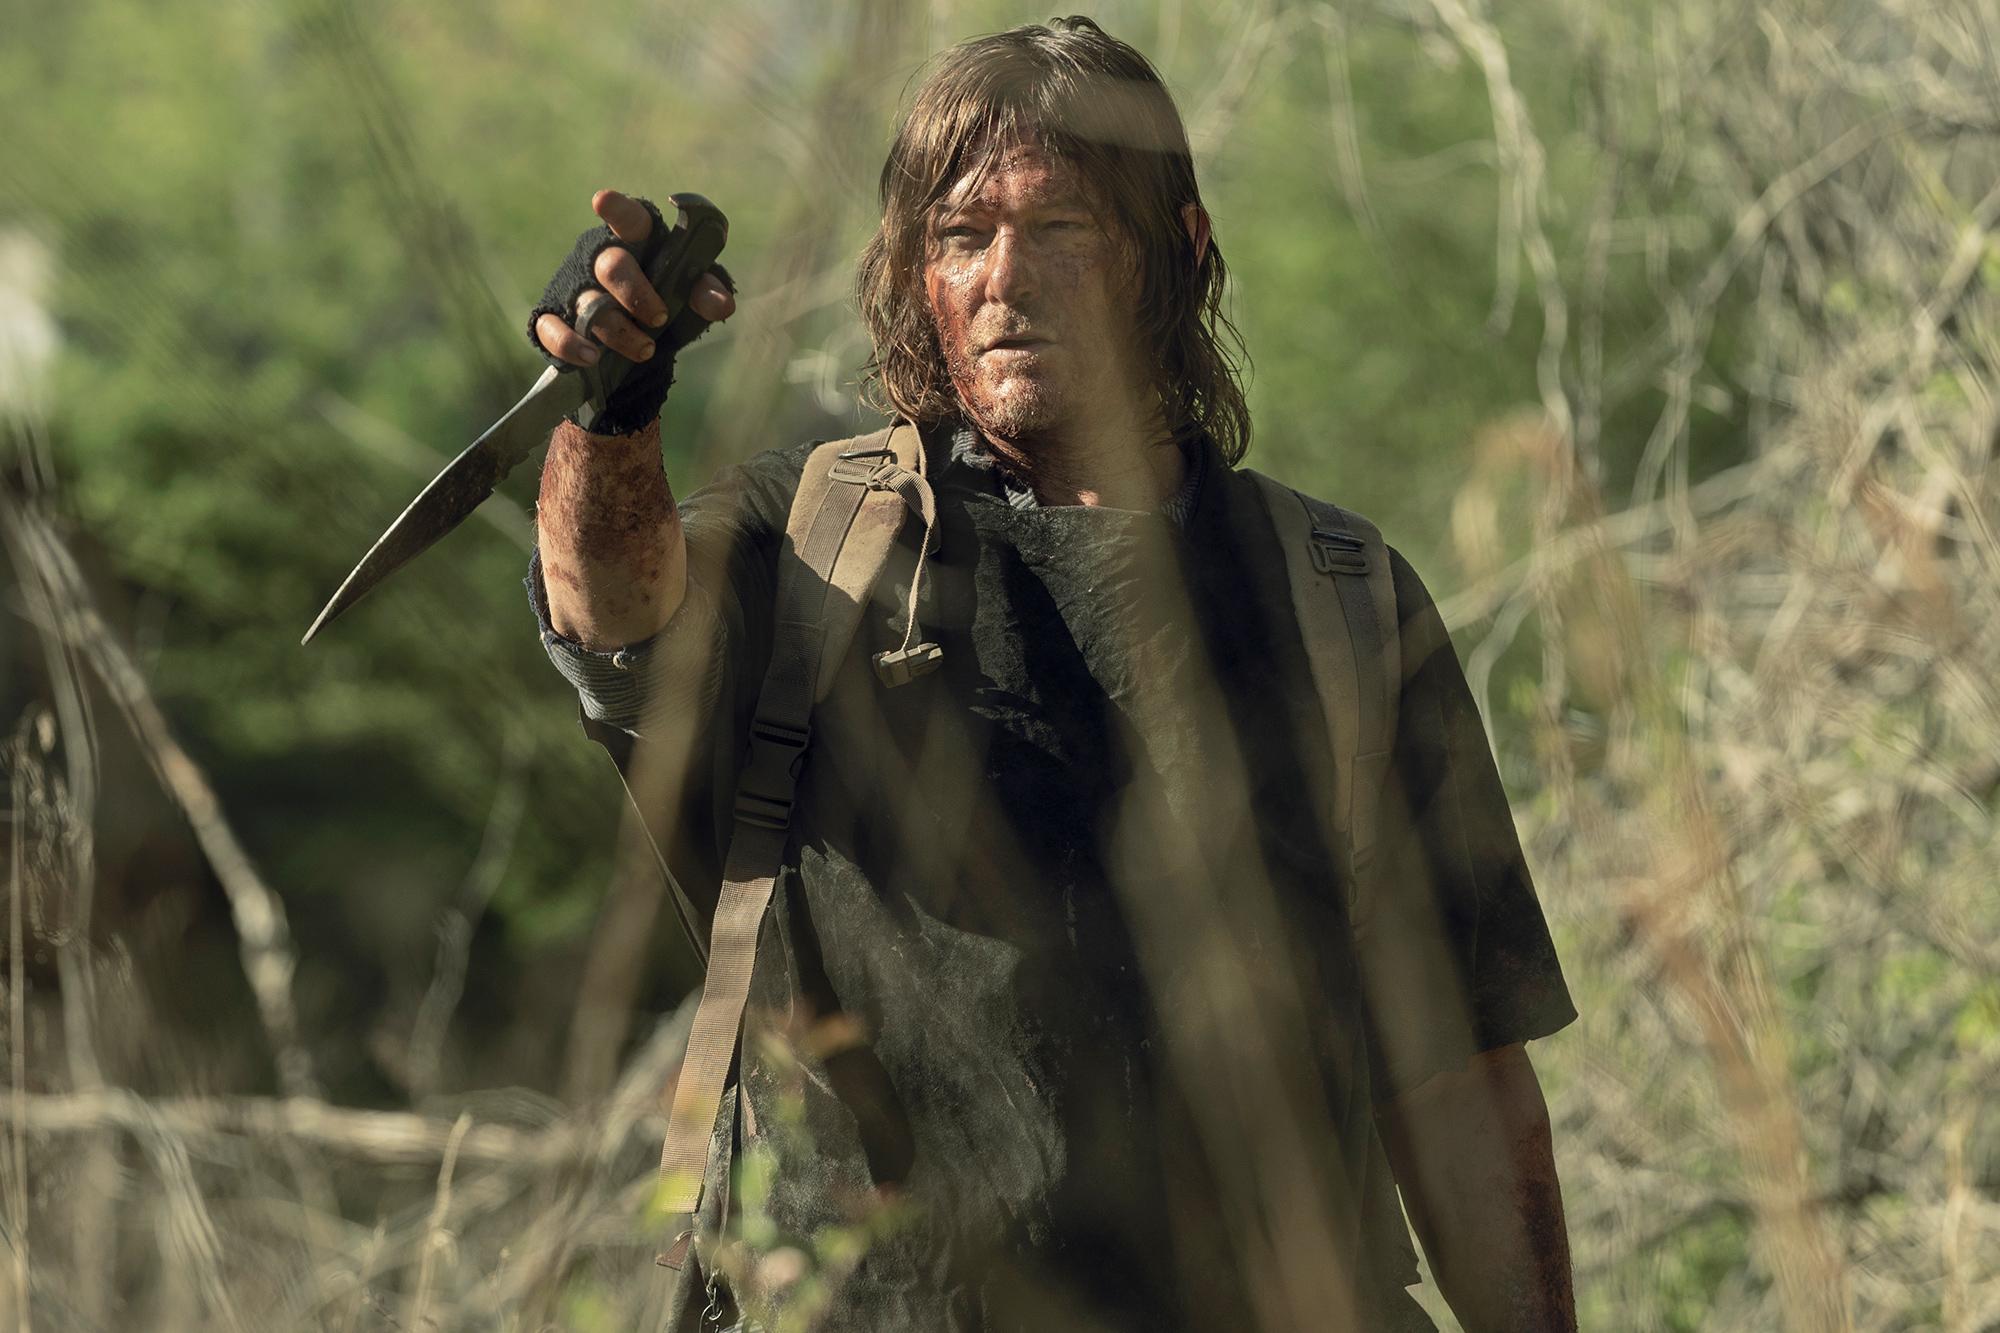 Norman Reedus as Daryl Dixon The Walking Dead Season 11, Episode 4